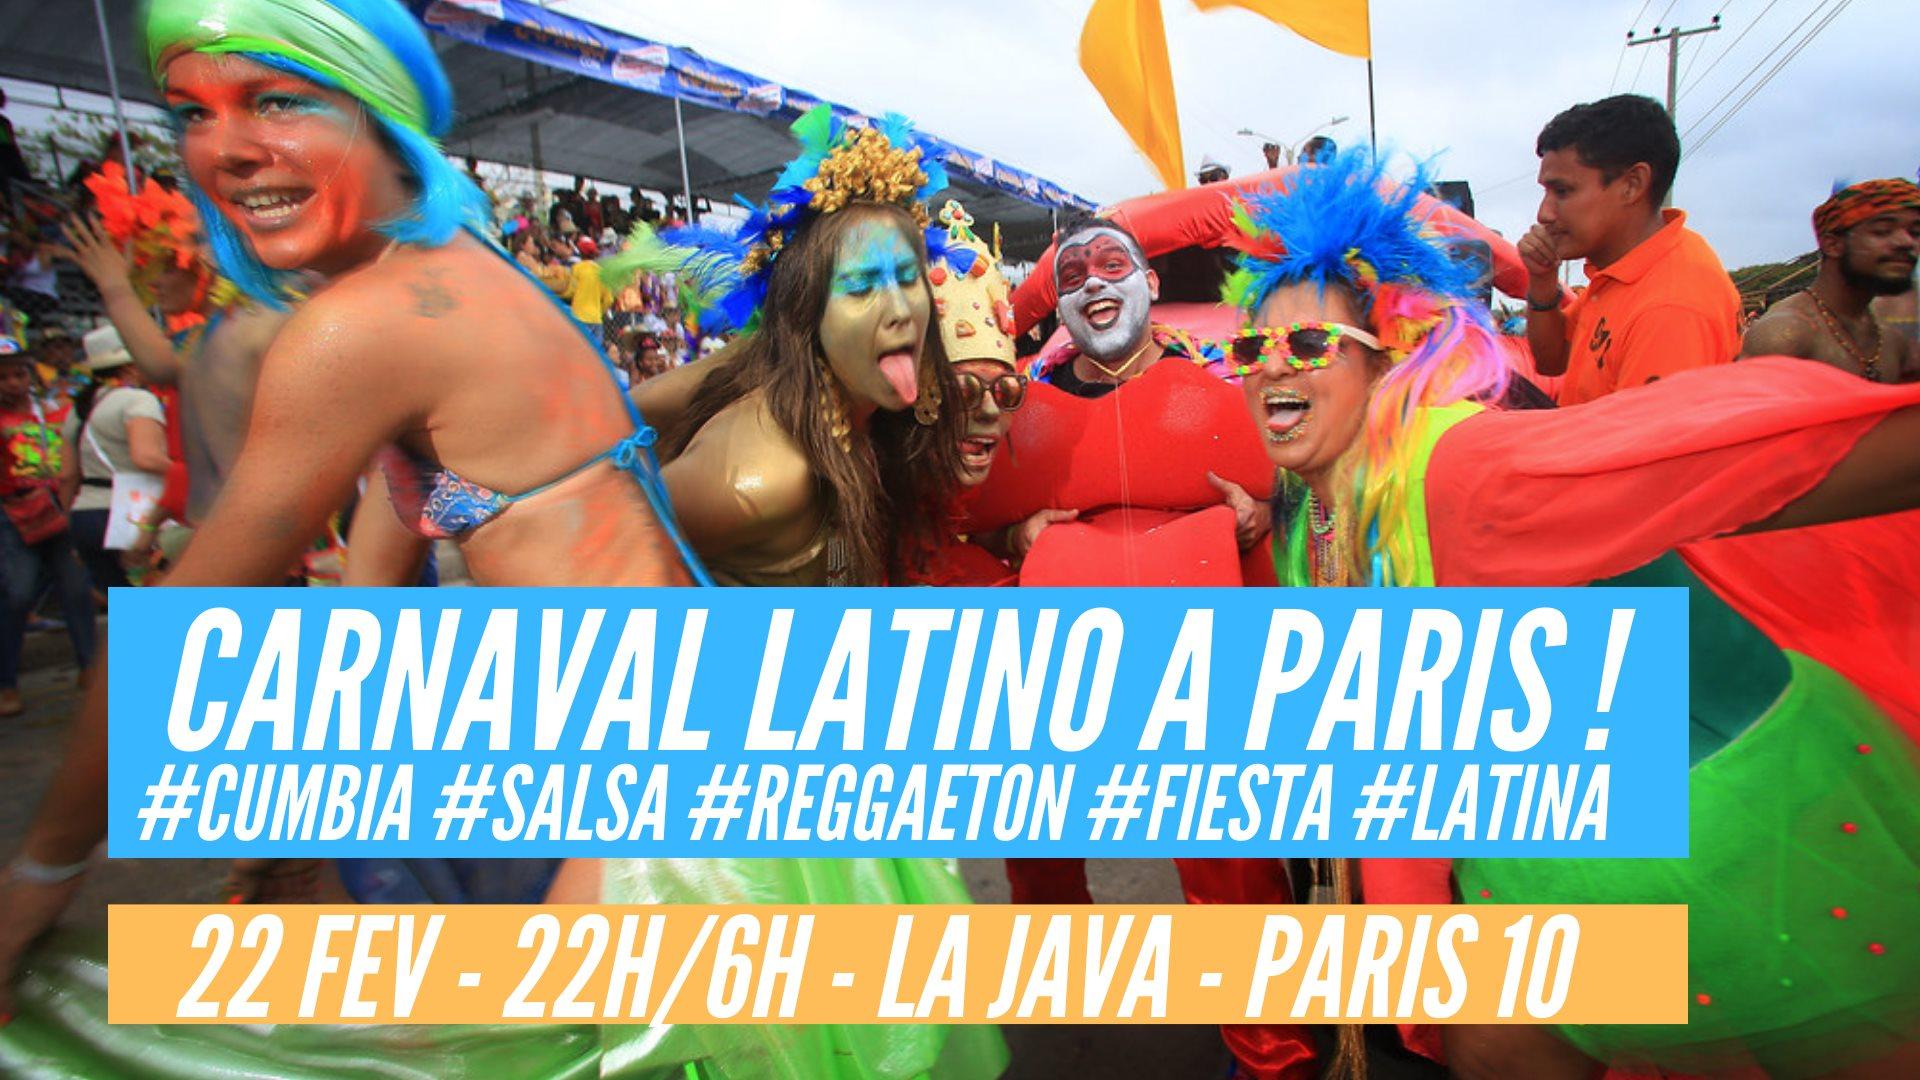 Carnaval Latino à Paris !